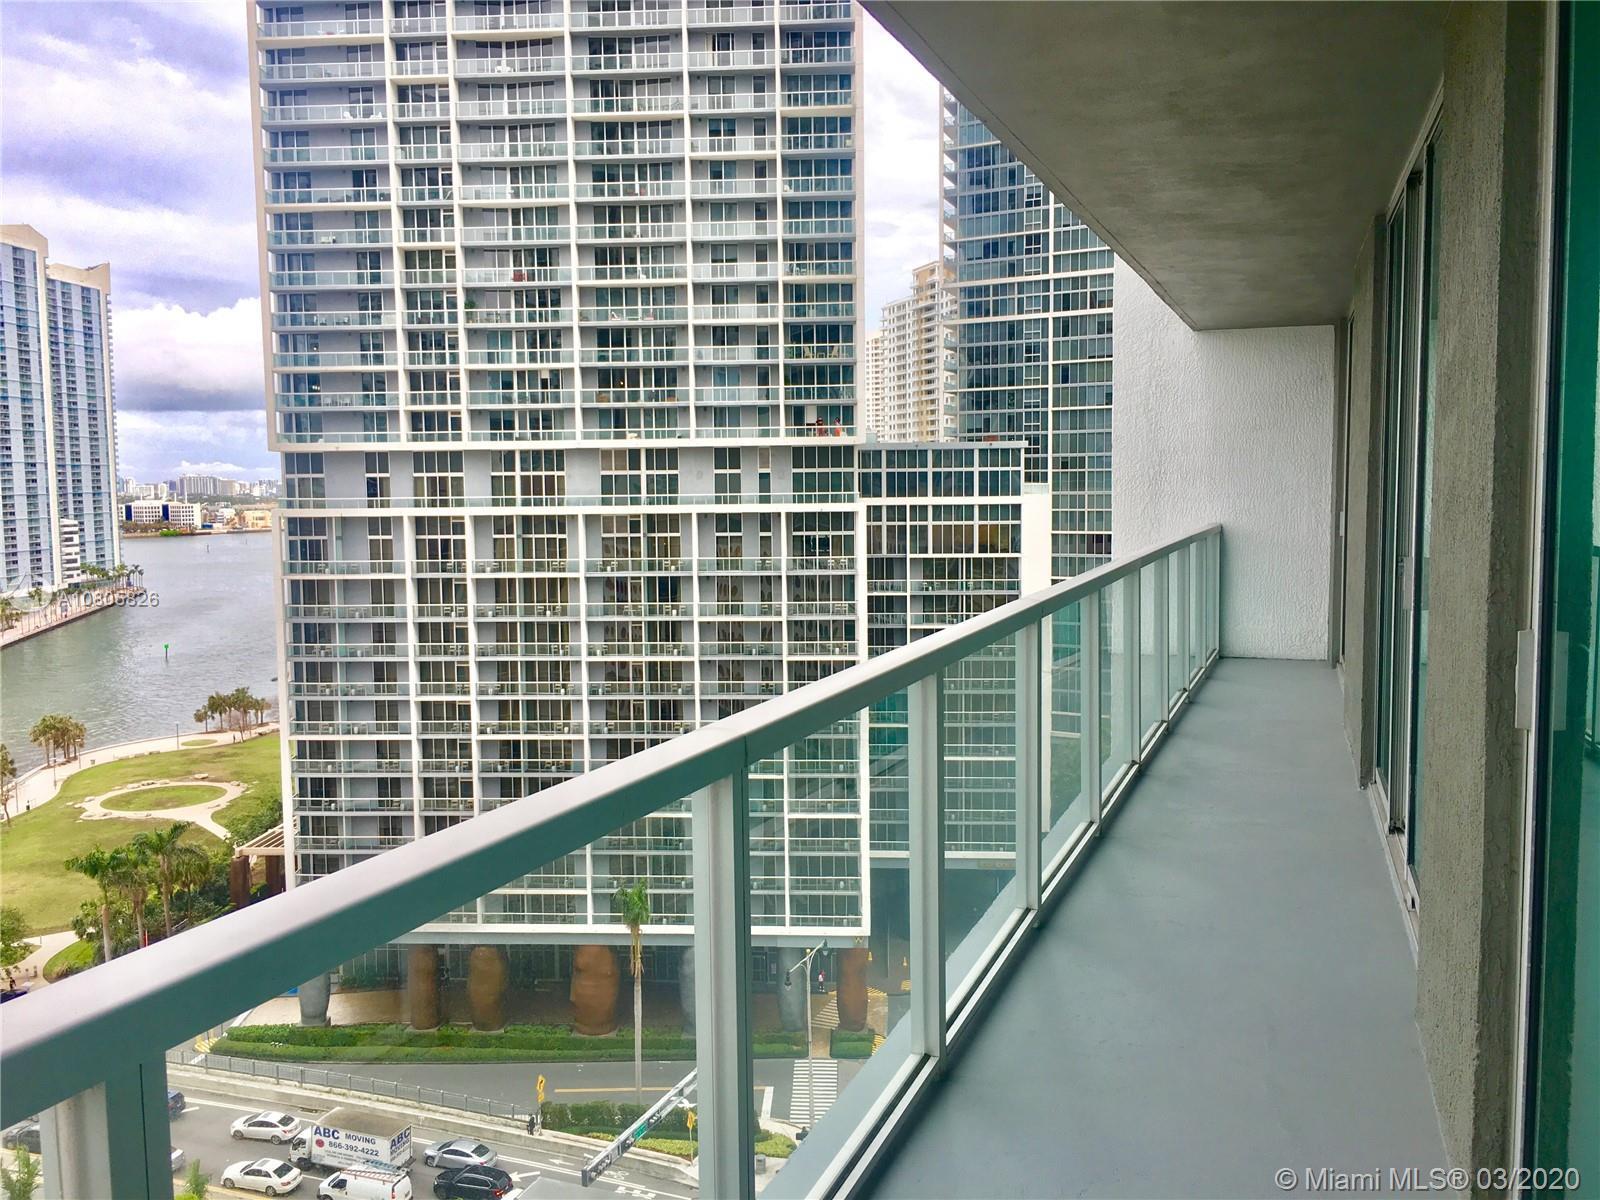 500 BRICKELL AV #1505, Miami, FL 33131 - Miami, FL real estate listing